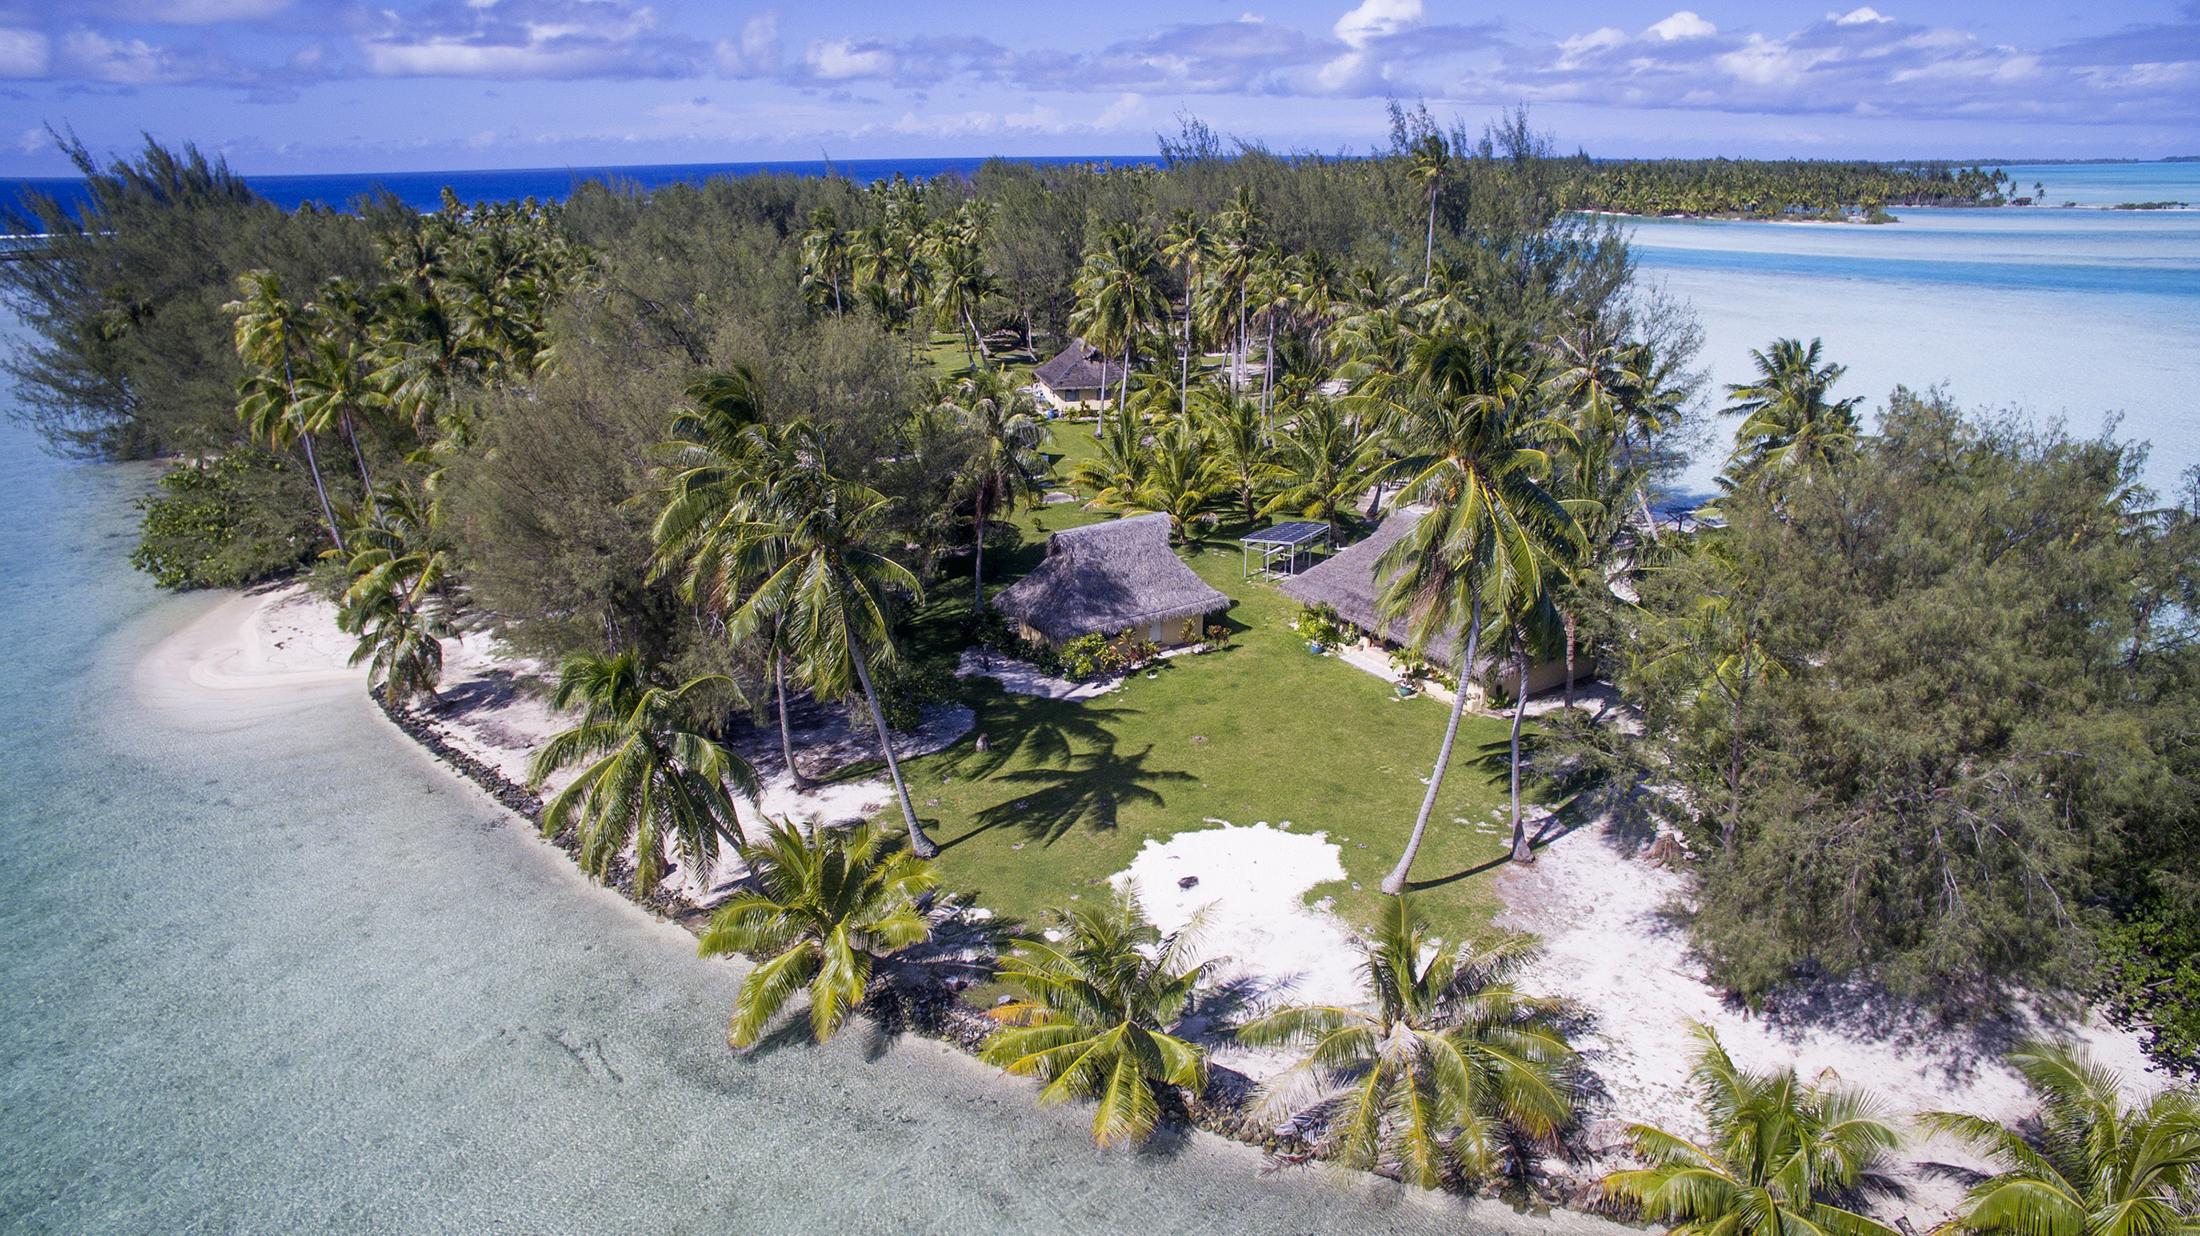 Private Insel für Verkauf beim Private island paradise Other French Polynesia, French Polynesia